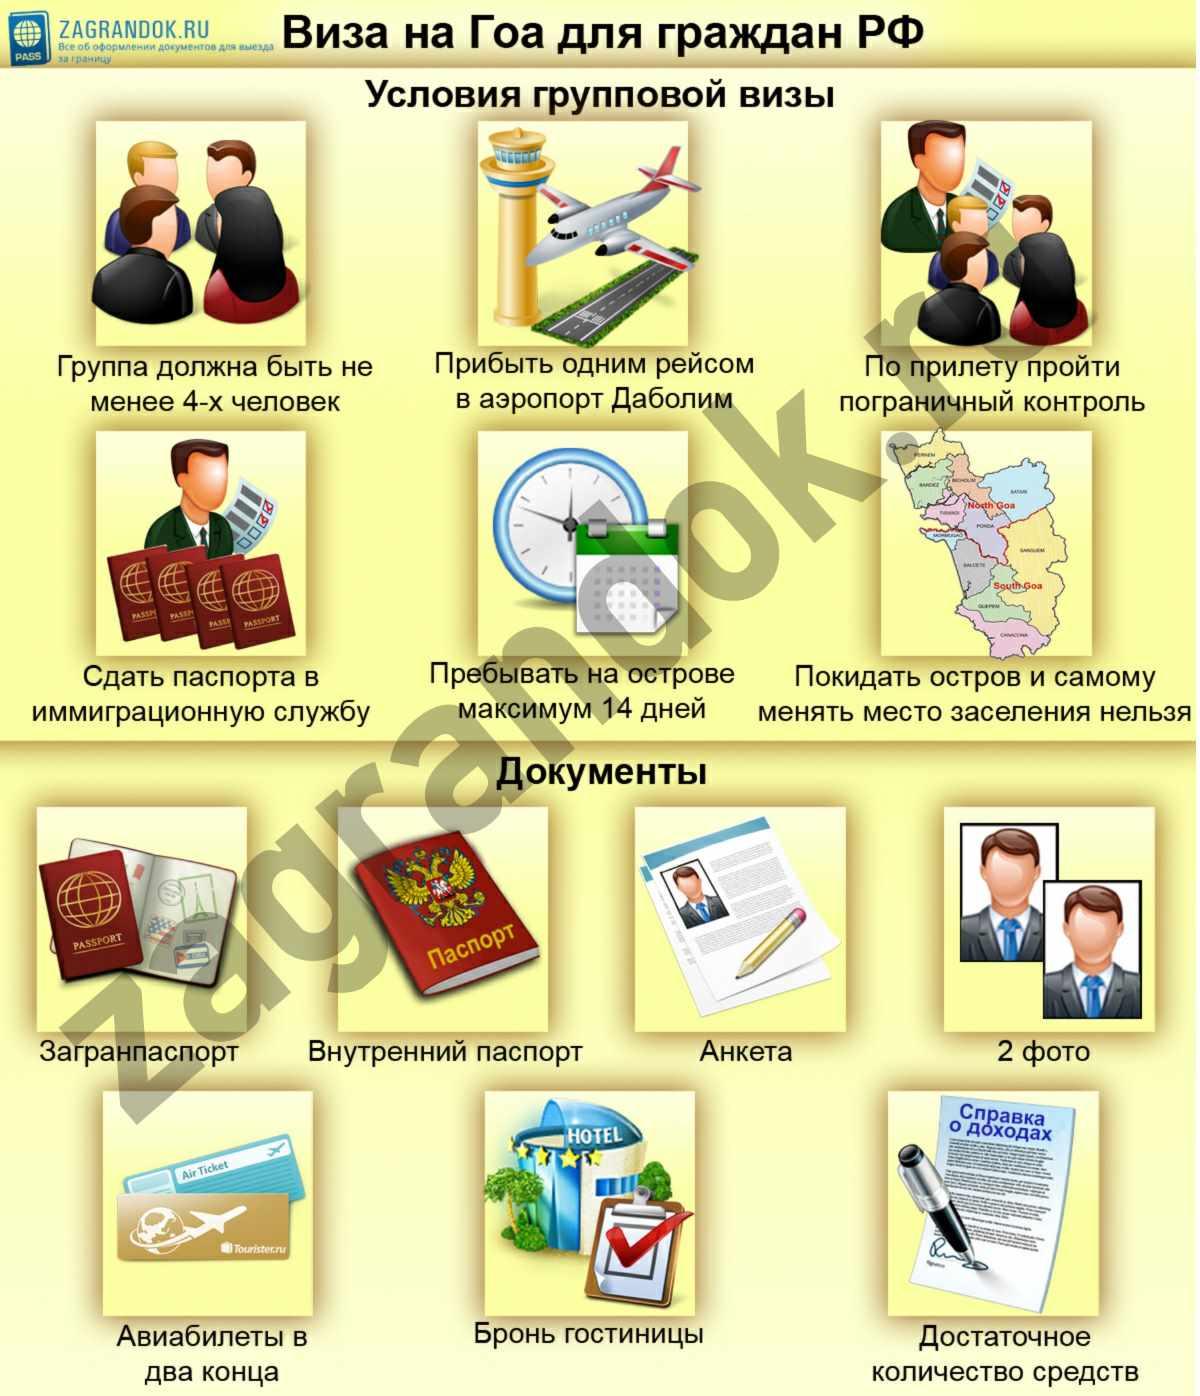 Виза на Гоа для граждан РФ